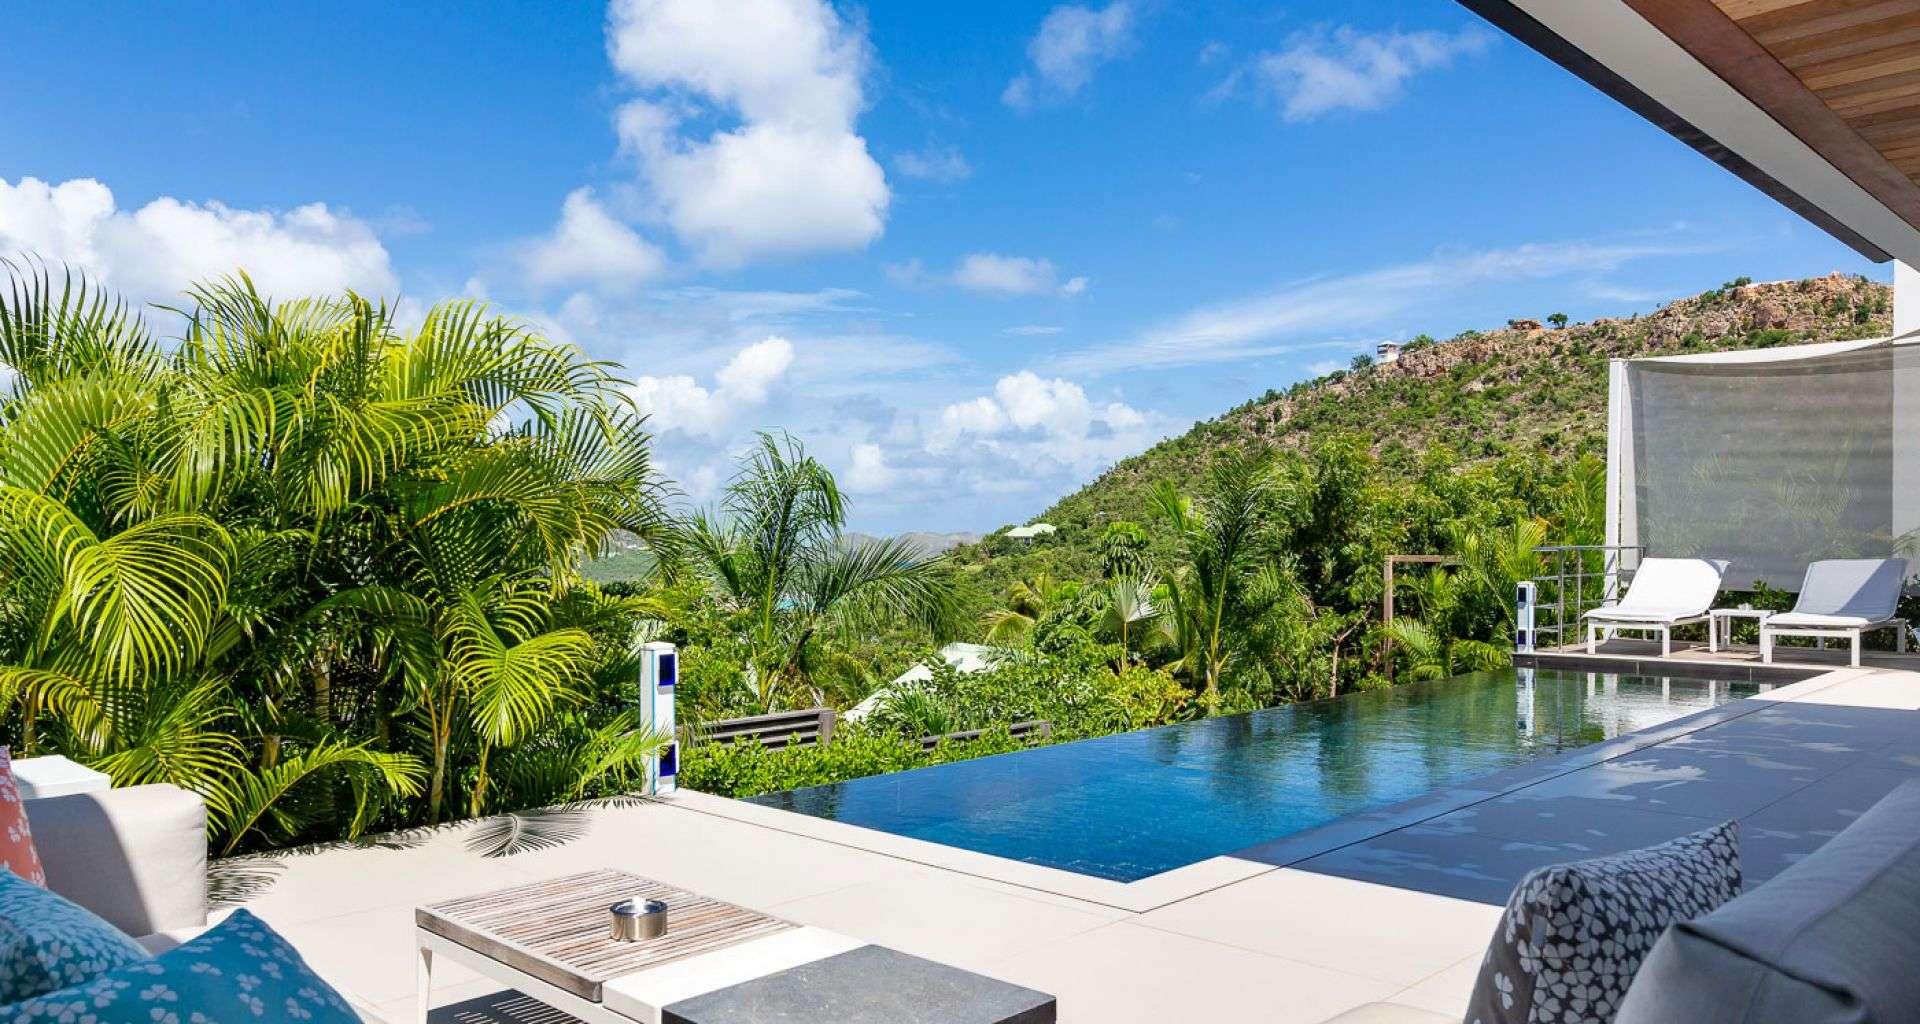 Luxury villa rentals caribbean - St barthelemy - Saint jean - Villa Indyana - Image 1/23